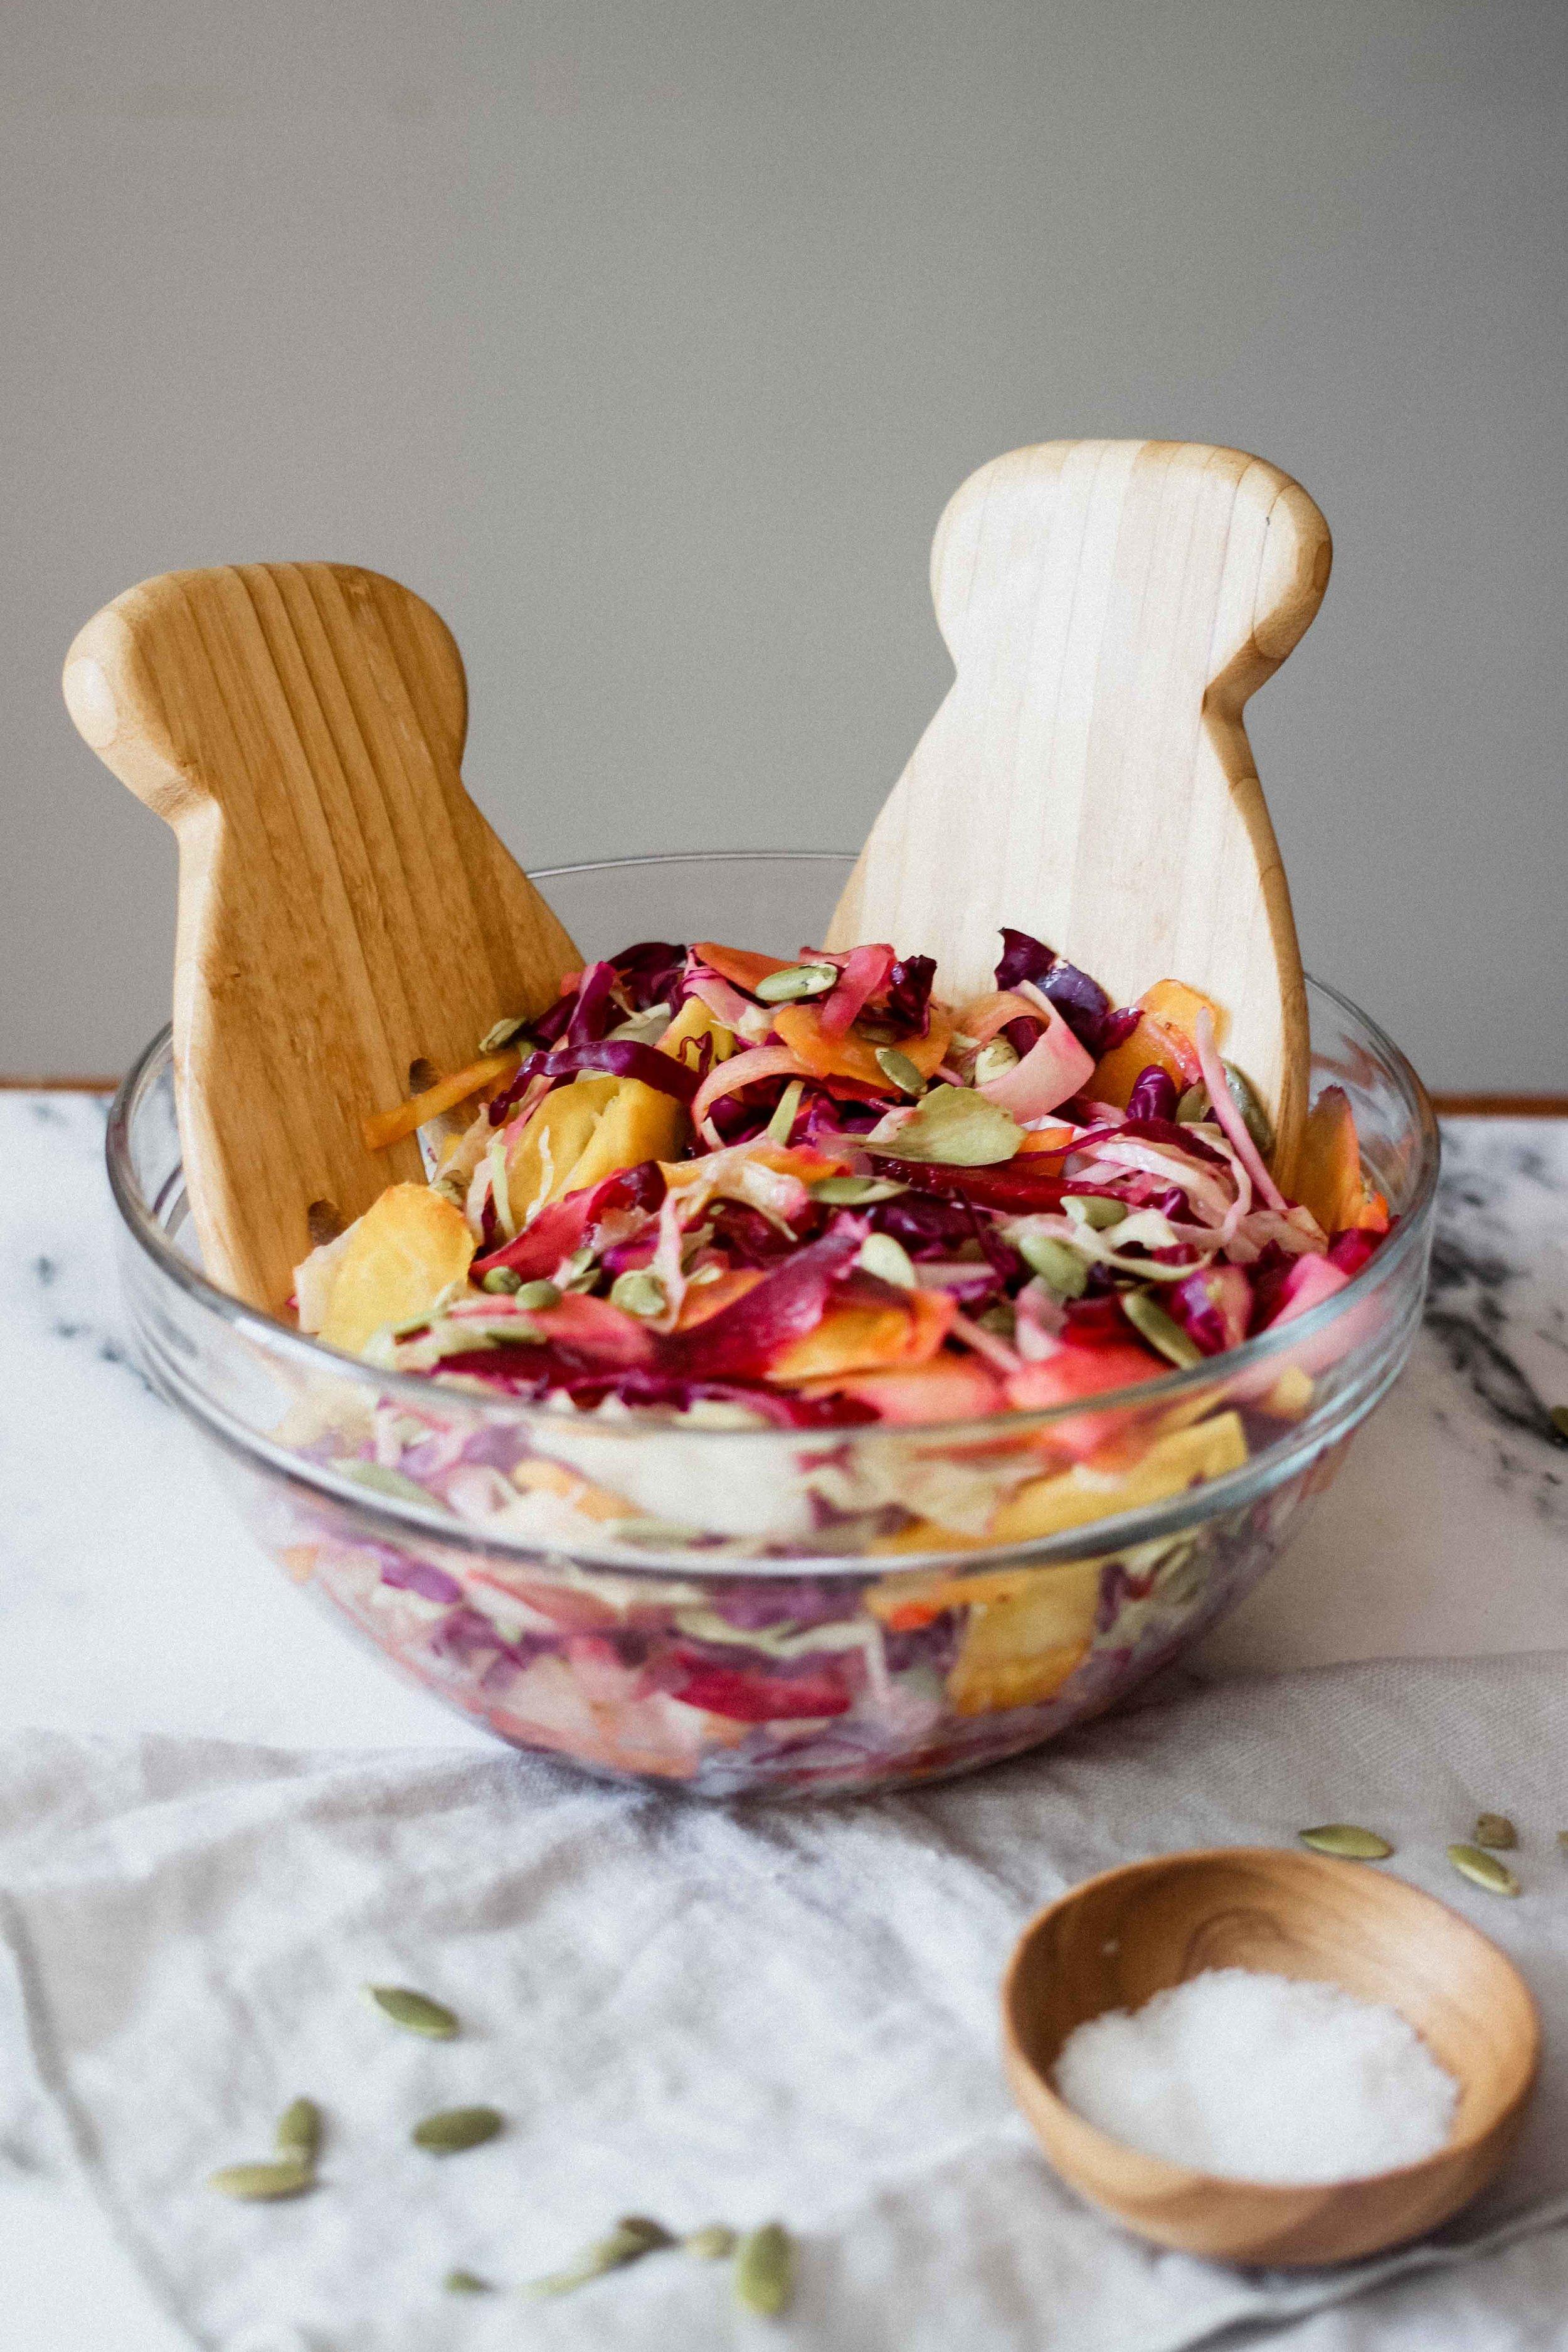 Winter Rainbow Cabbage Slaw With Lemon Vinaigrette - The Well Essentials